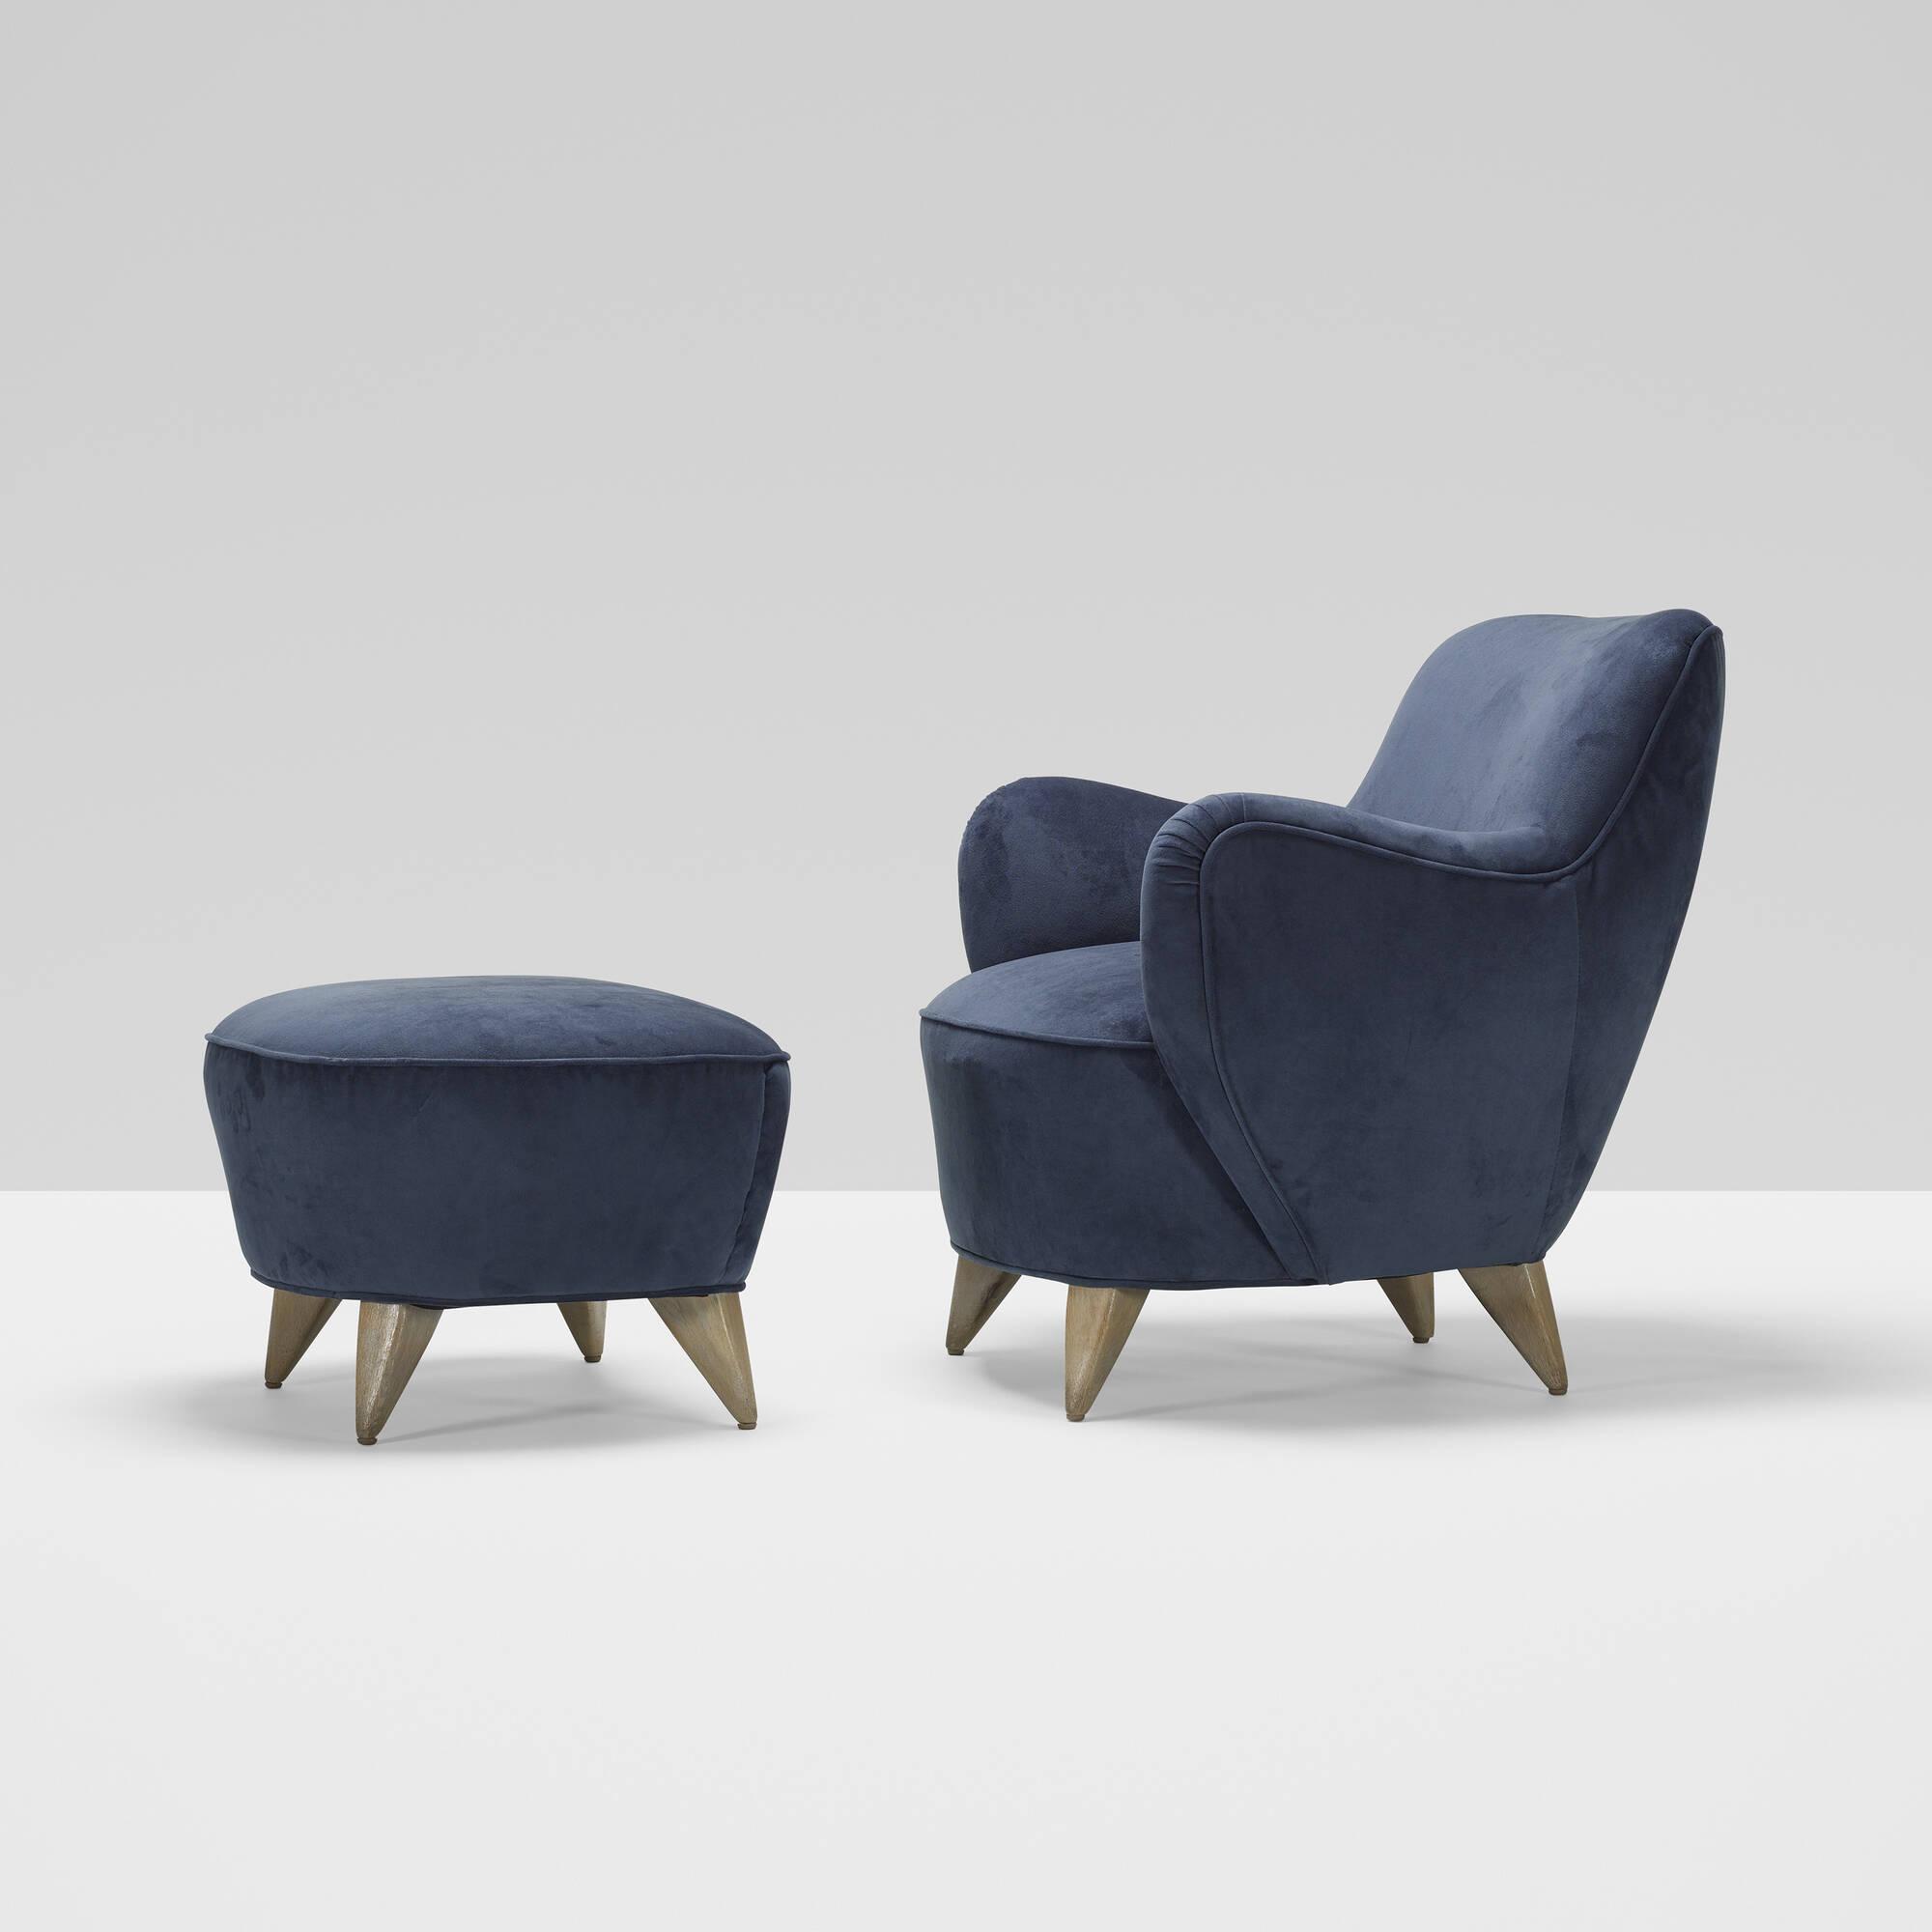 305 Vladimir Kagan Barrel chair and ottoman Design 11 June